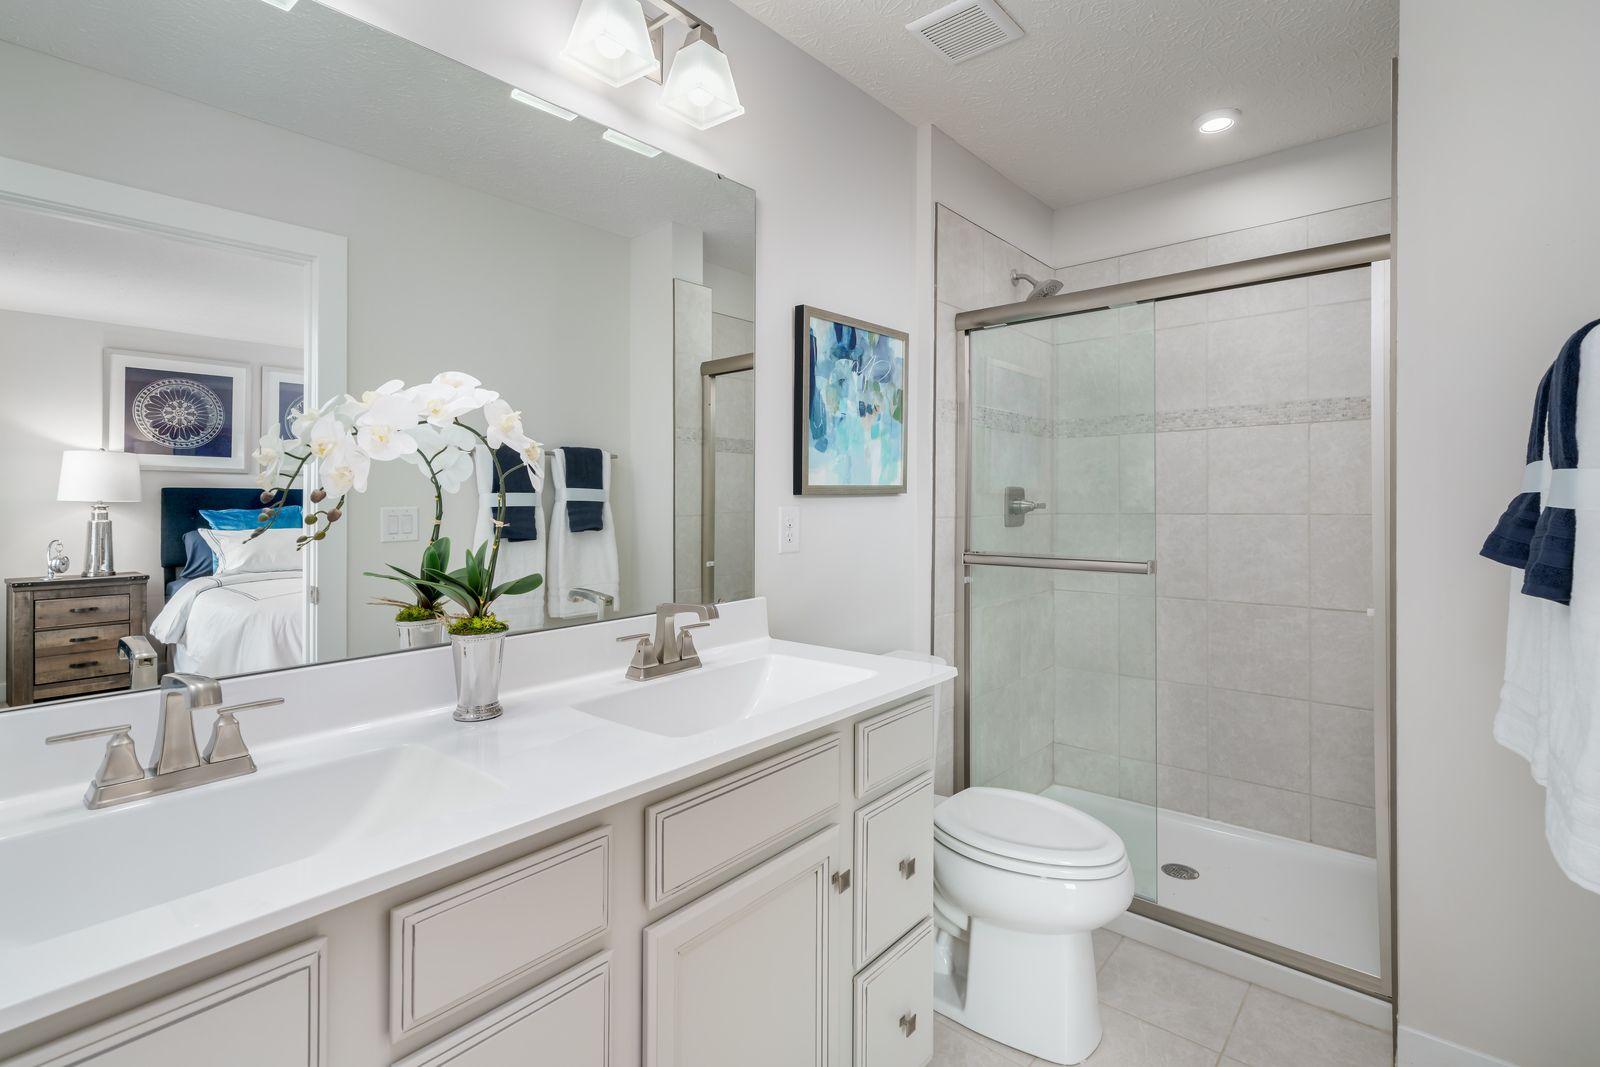 Bathroom featured in the Turks & Caicos By Ryan Homes in Harrisonburg, VA